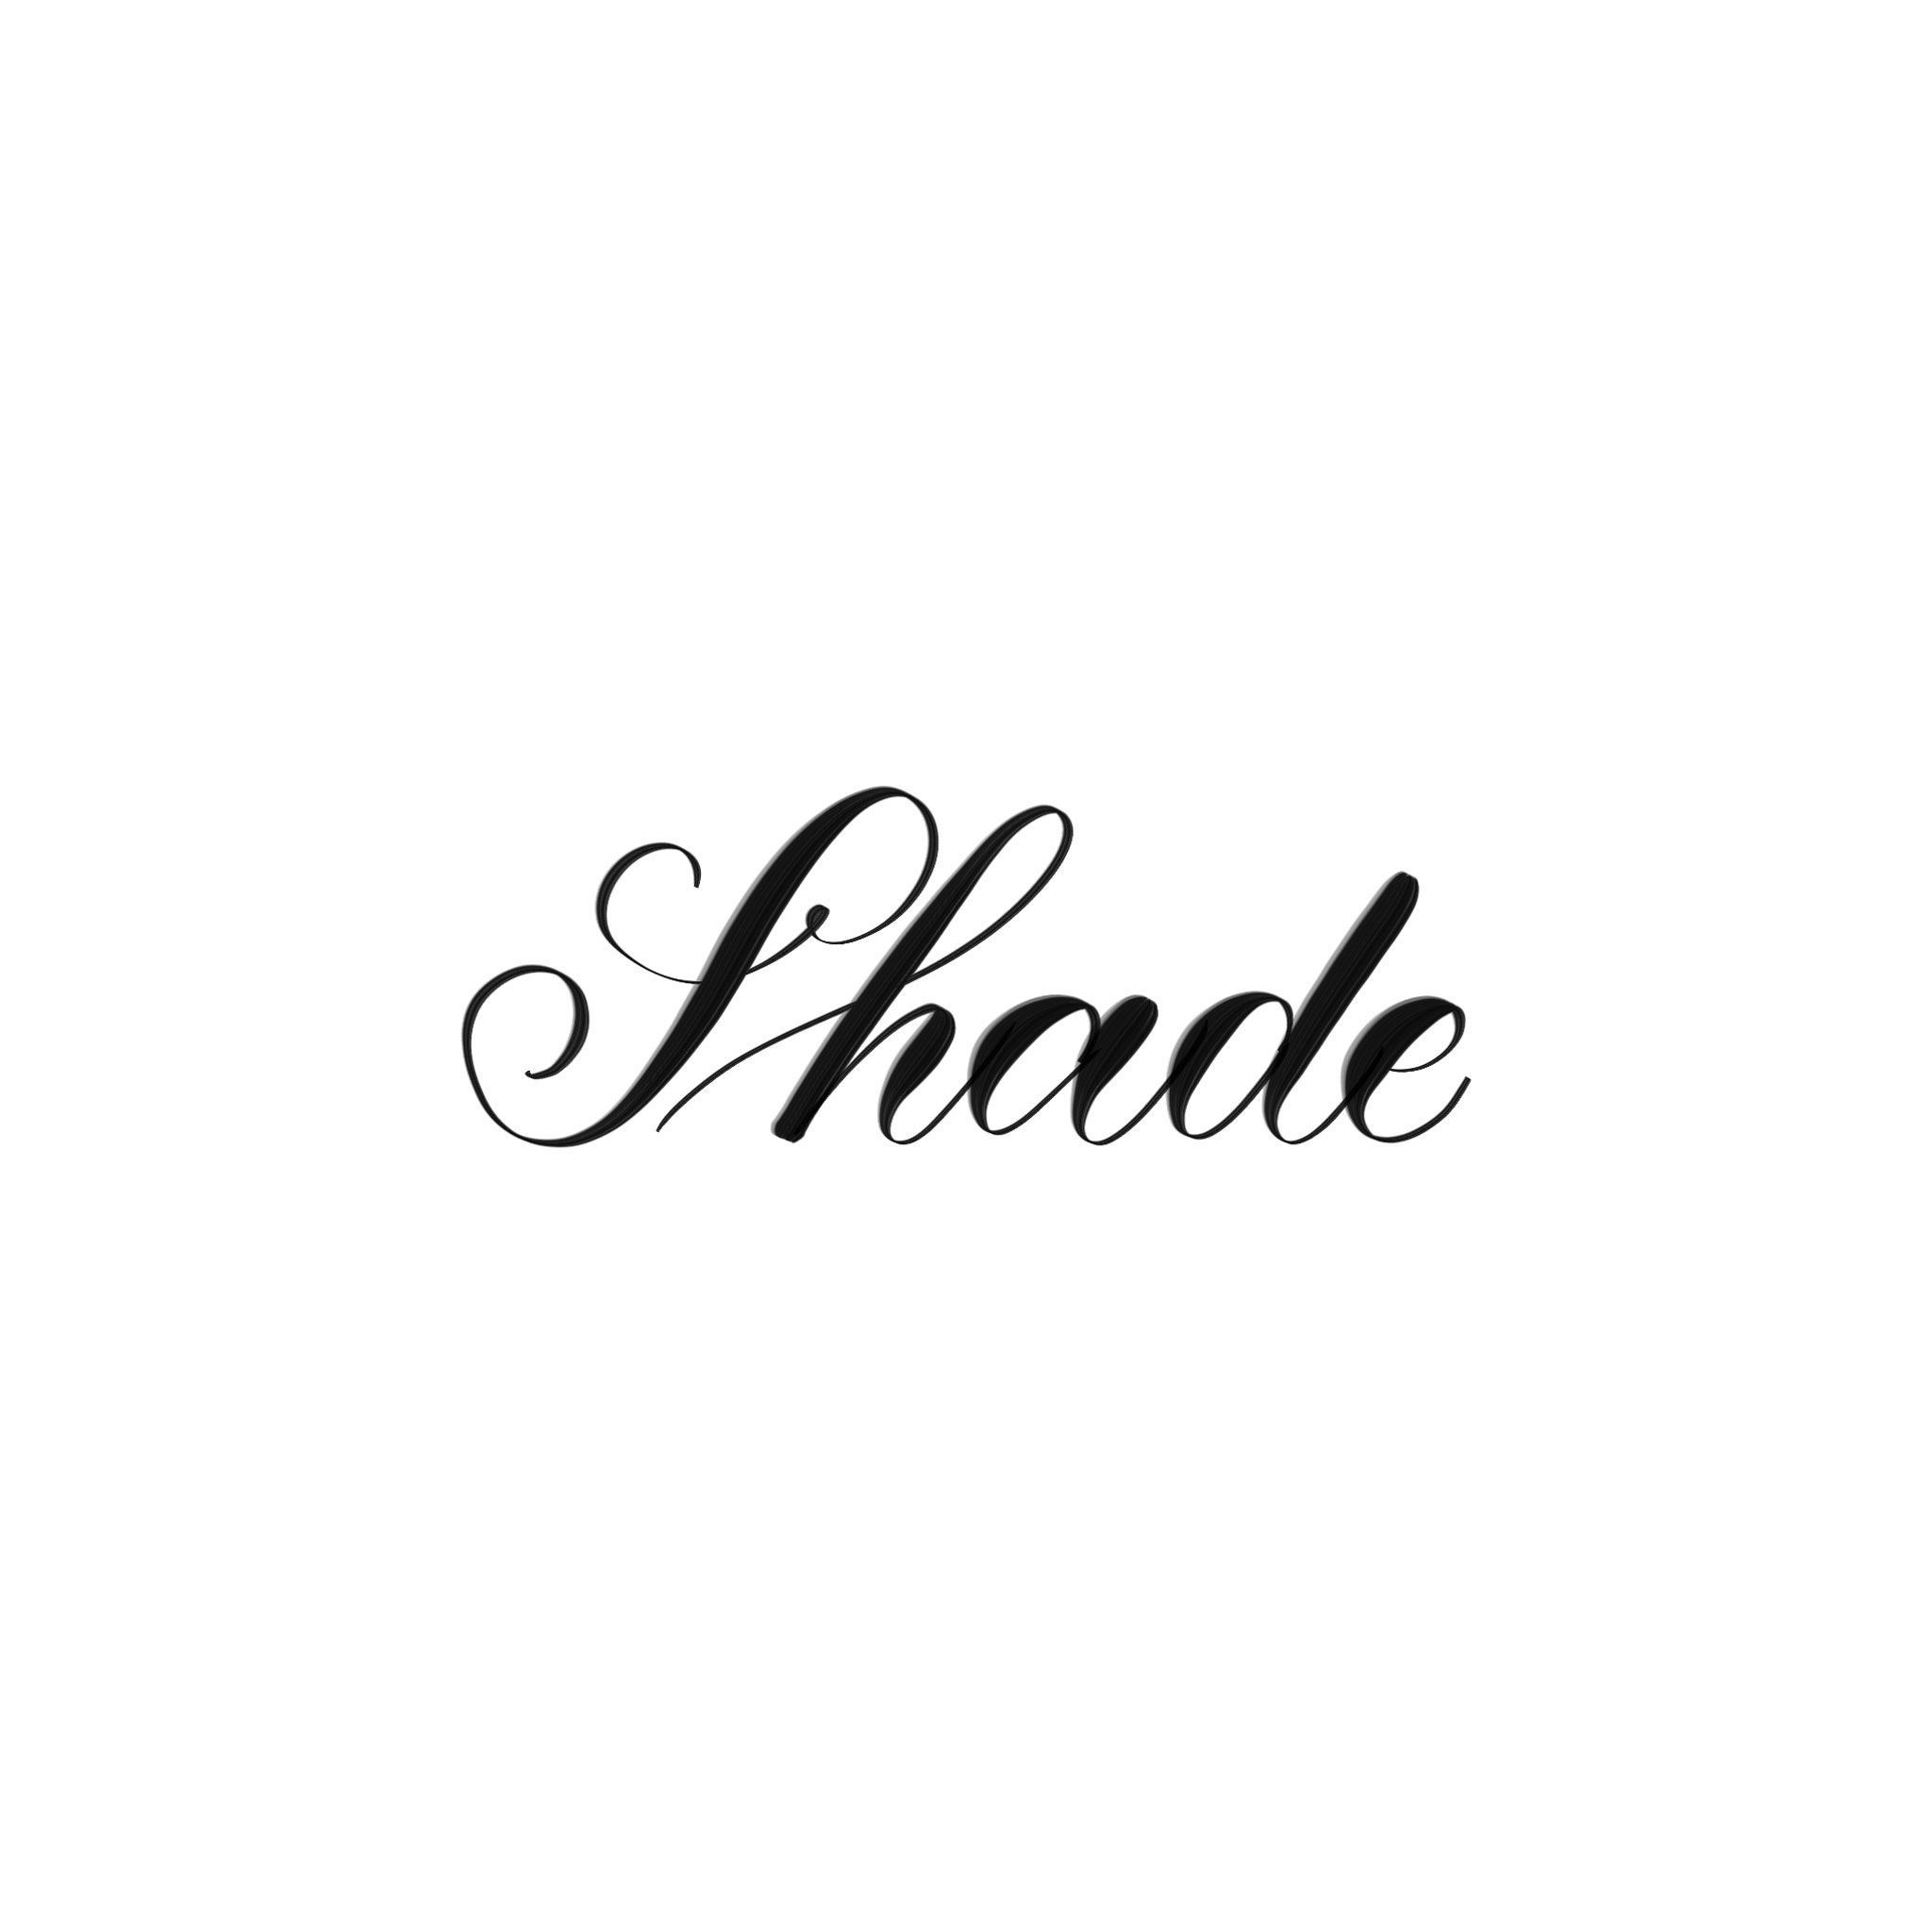 Shade Procreate Lettering Brush - halfapx